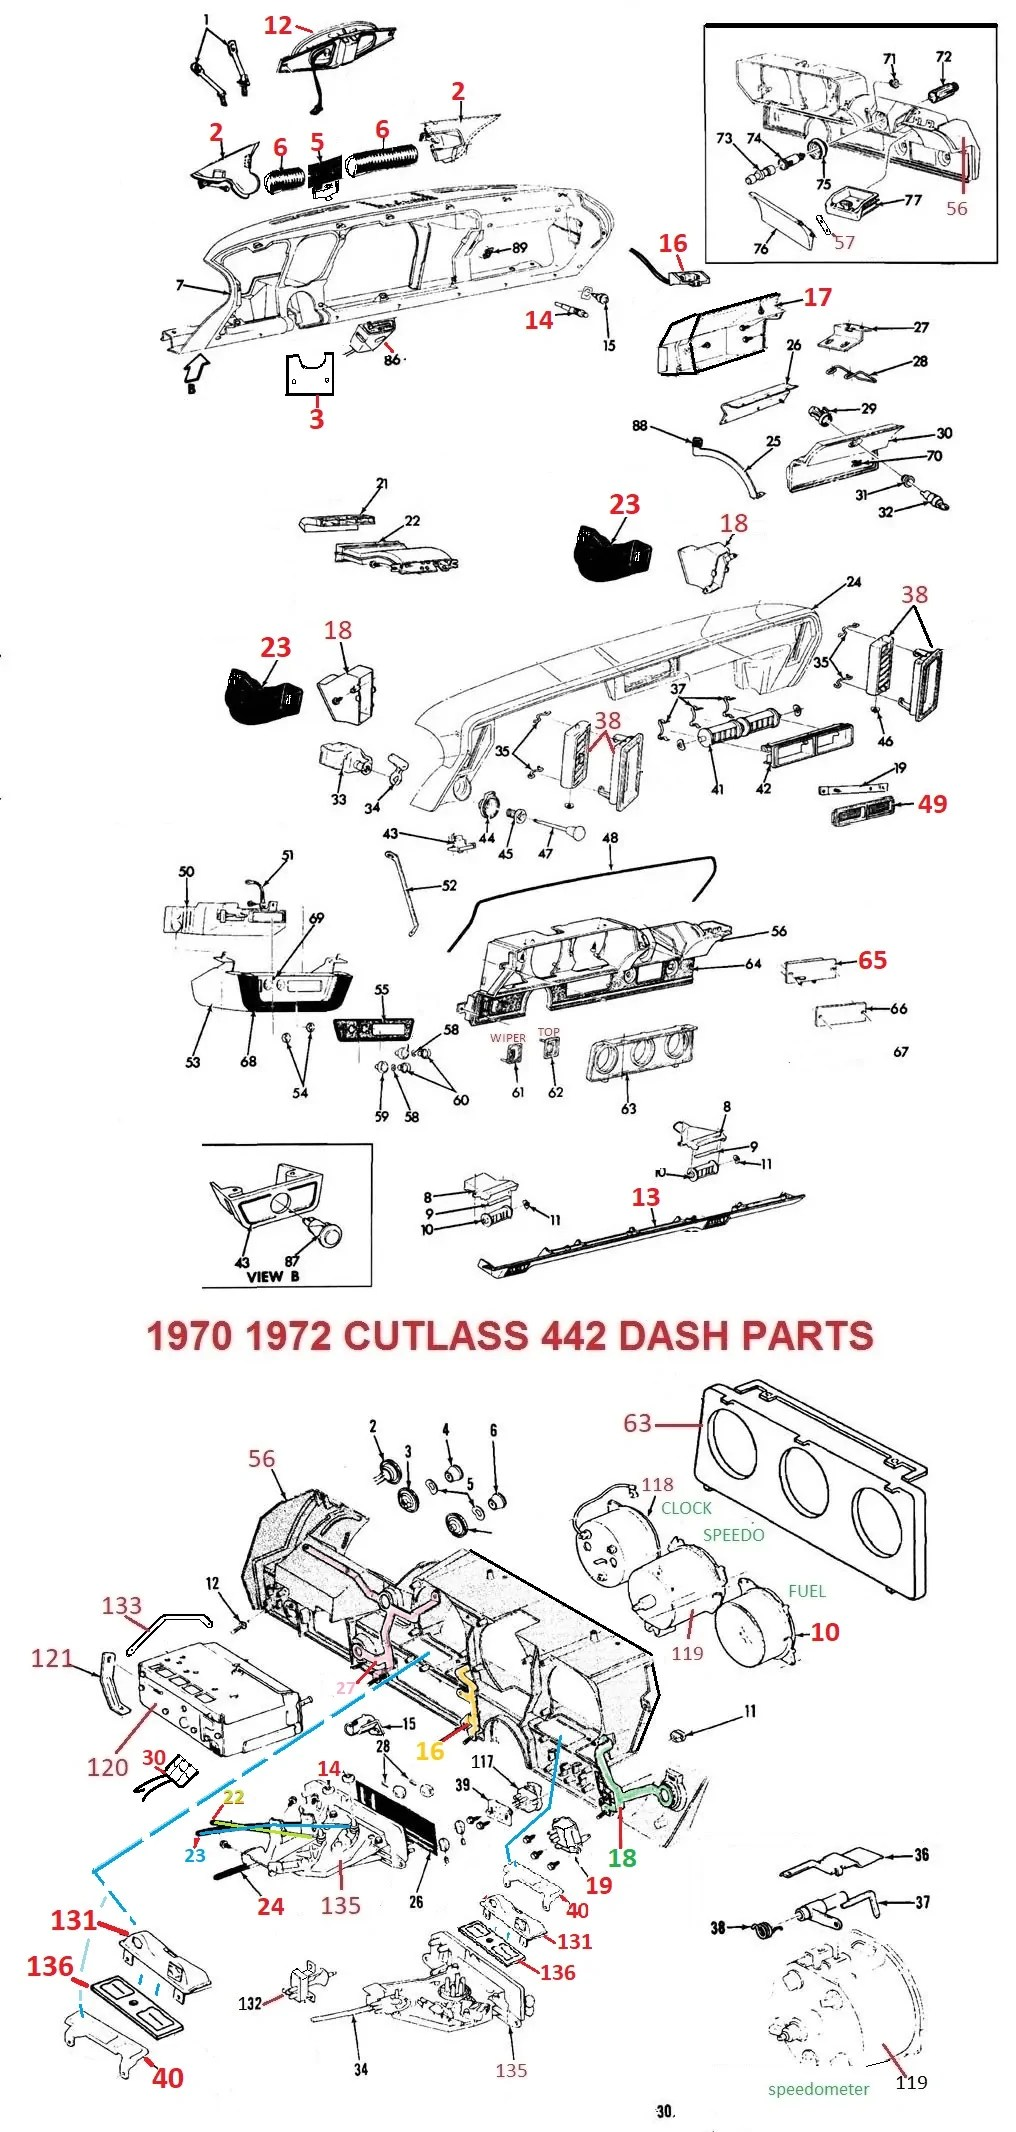 70 71 72 cutlass 442 dash parts [ 1016 x 2132 Pixel ]